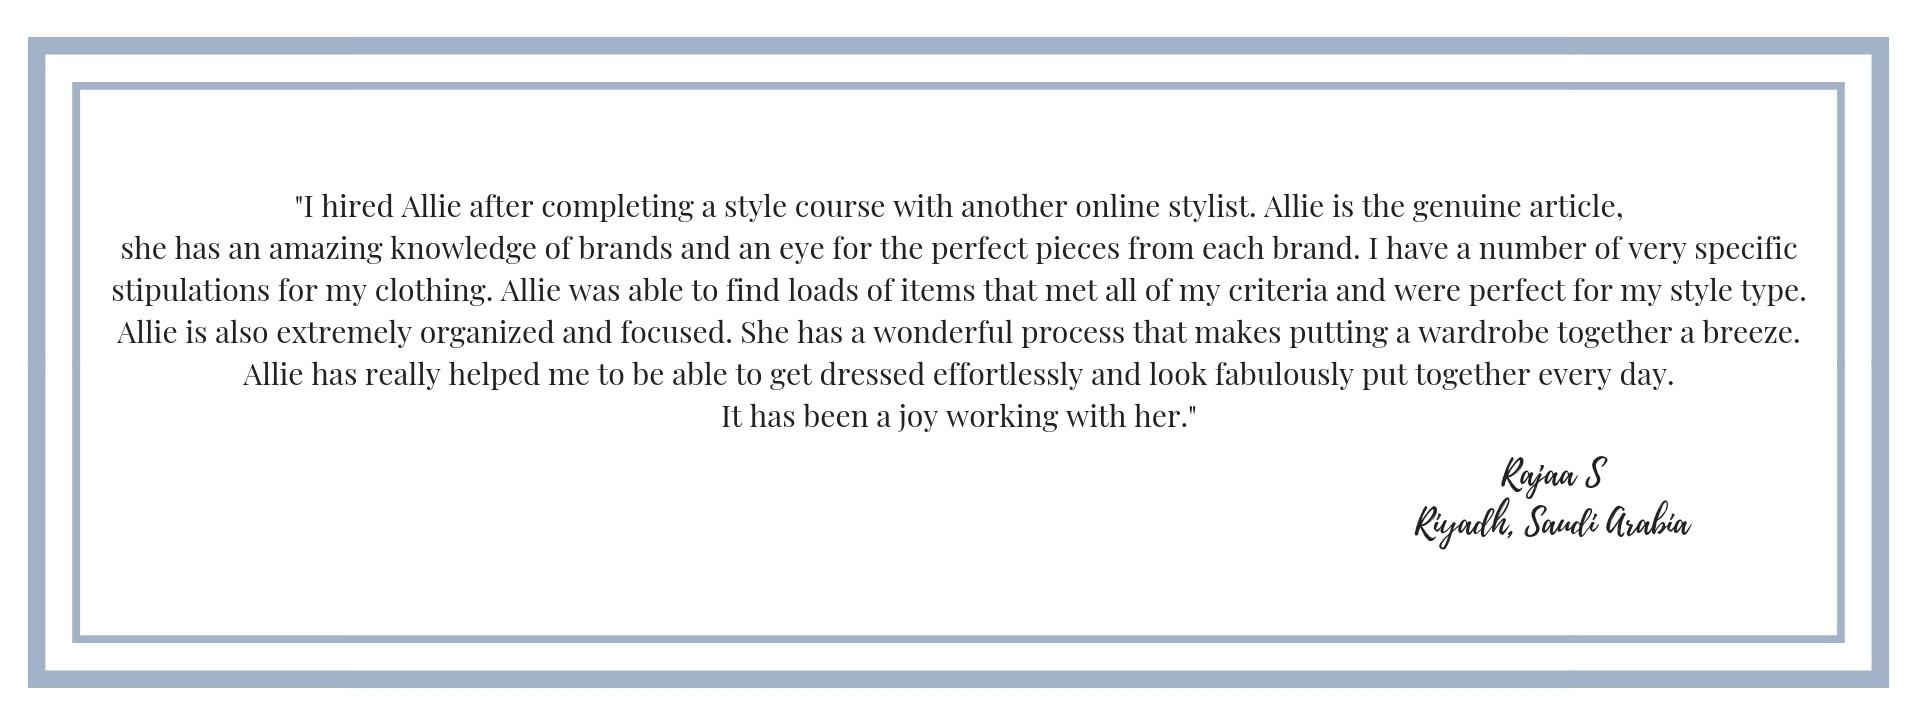 Rajaa_S_review_Allie_Brandwein_image_wardrobe_consultant_virtual_stylist_nyc+%281%29.jpg